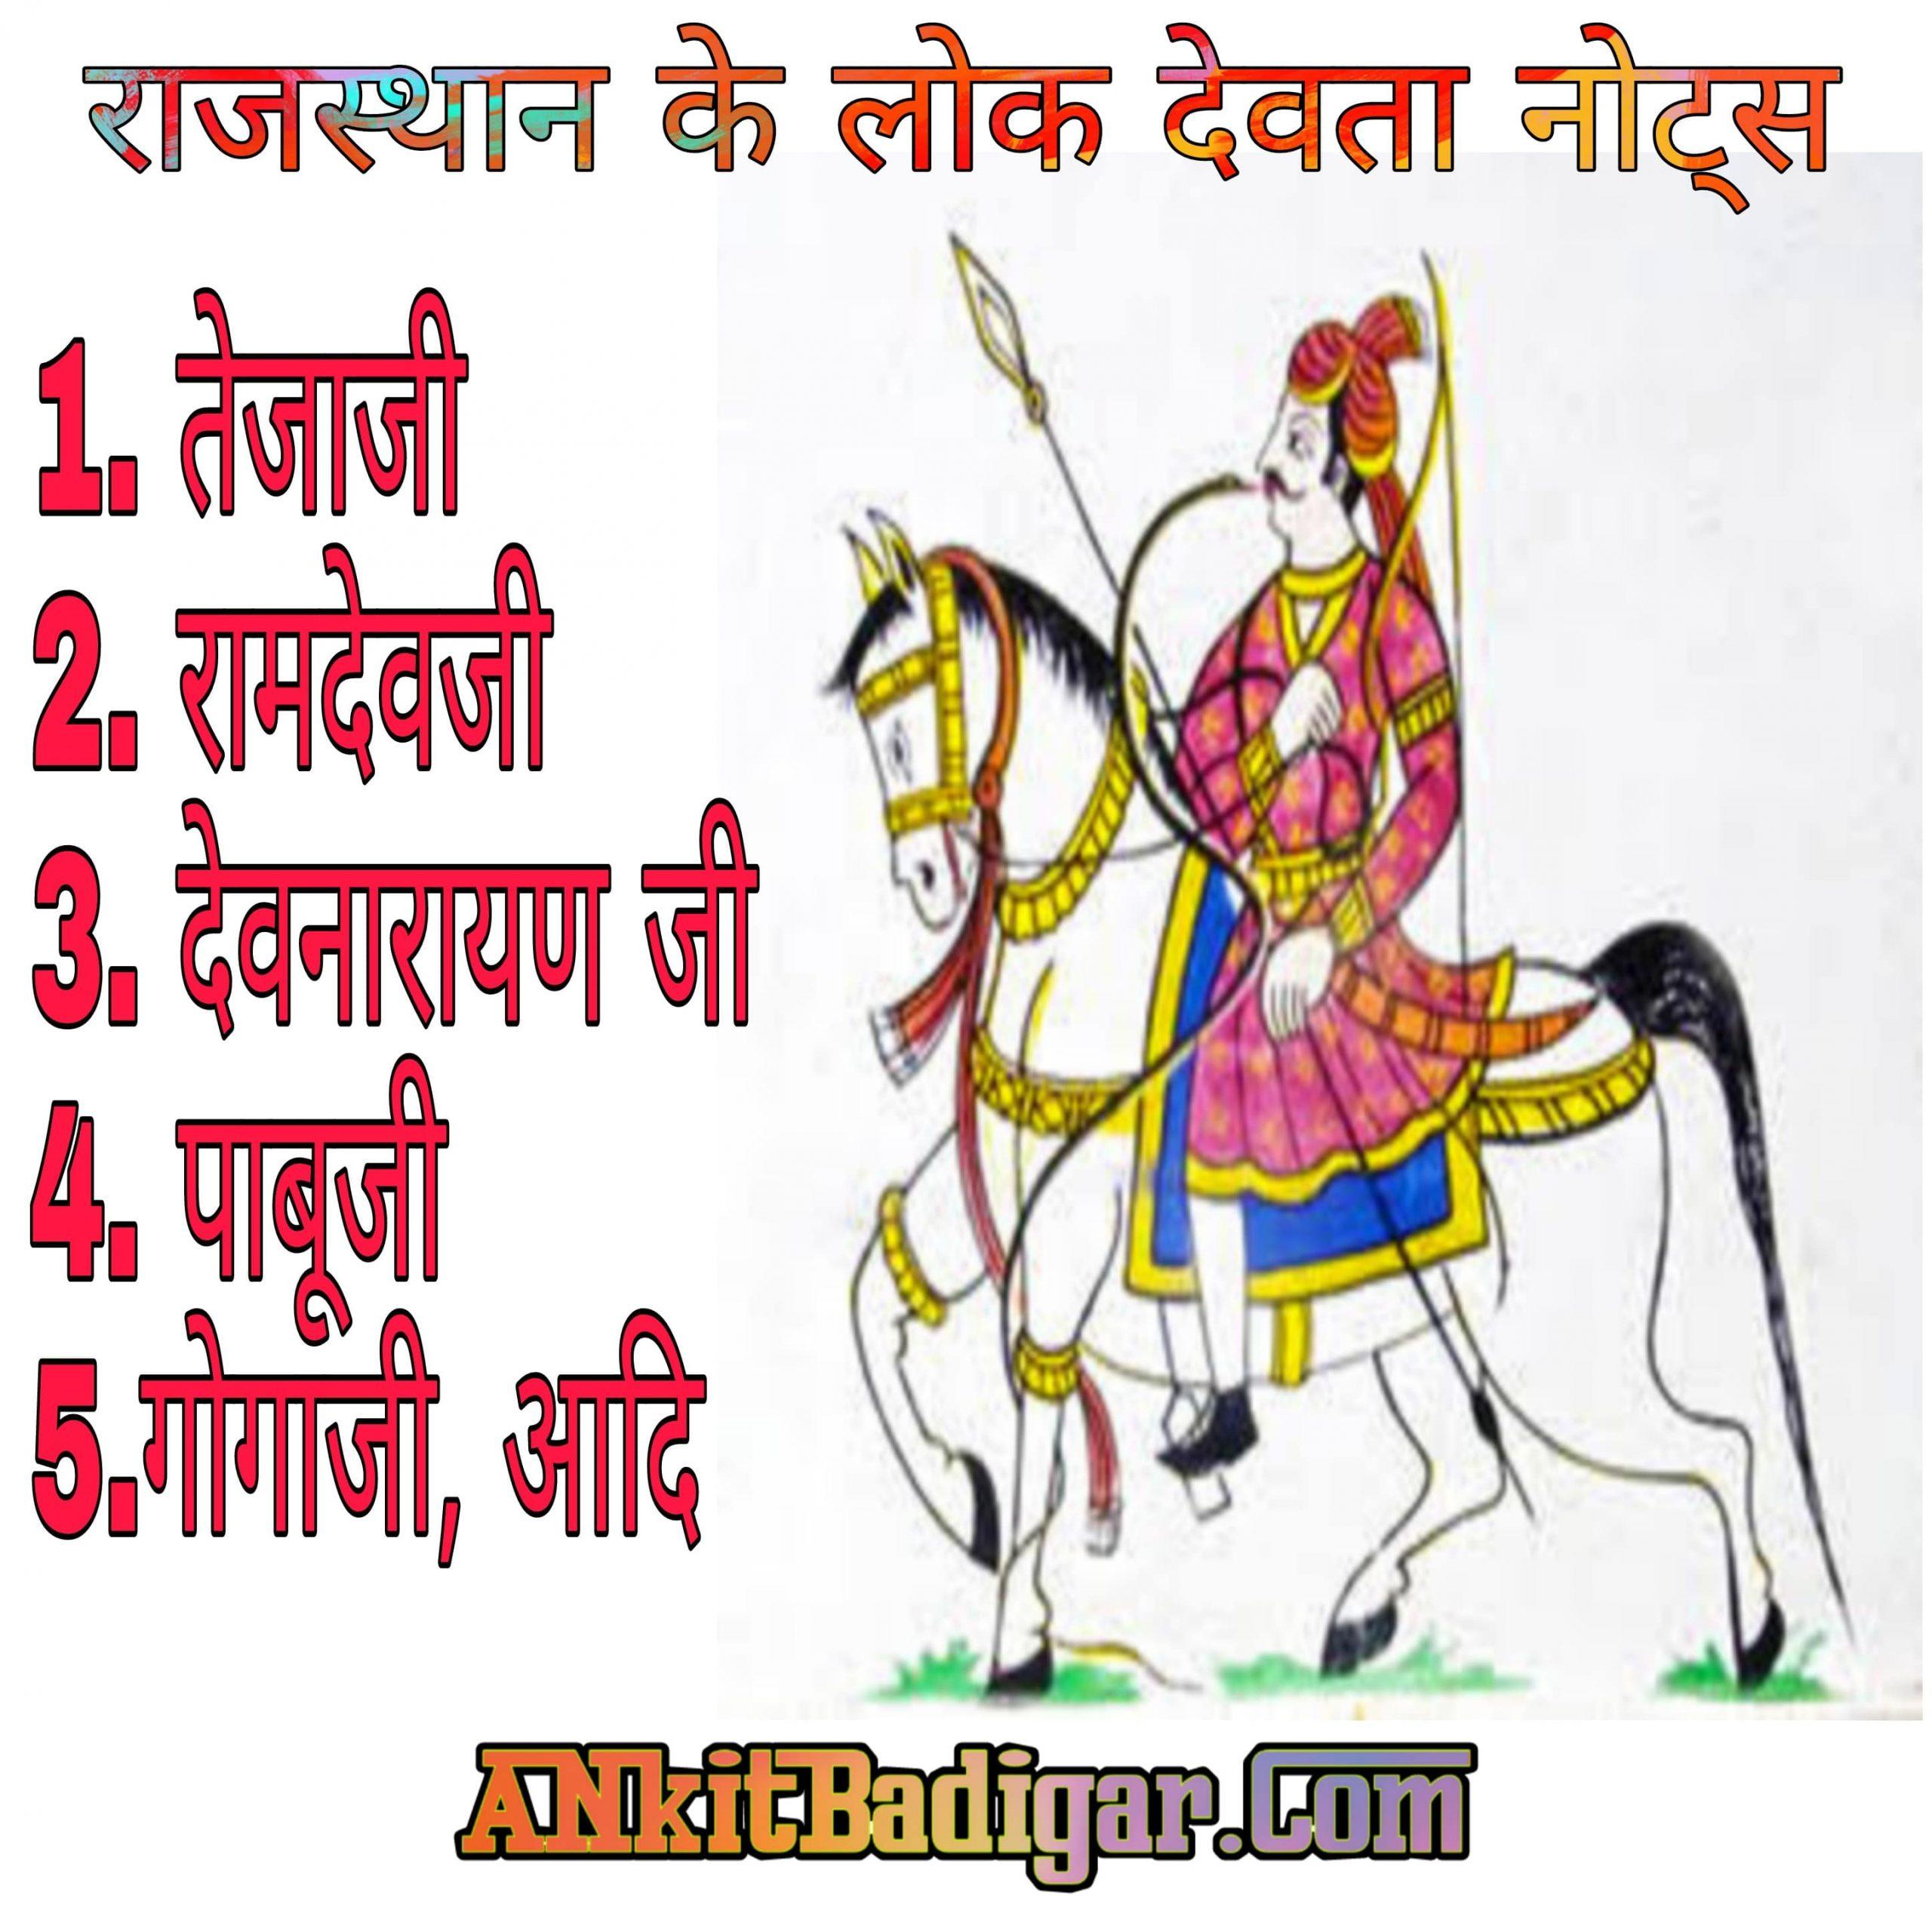 Rajasthan ke lok devta notes in hindi